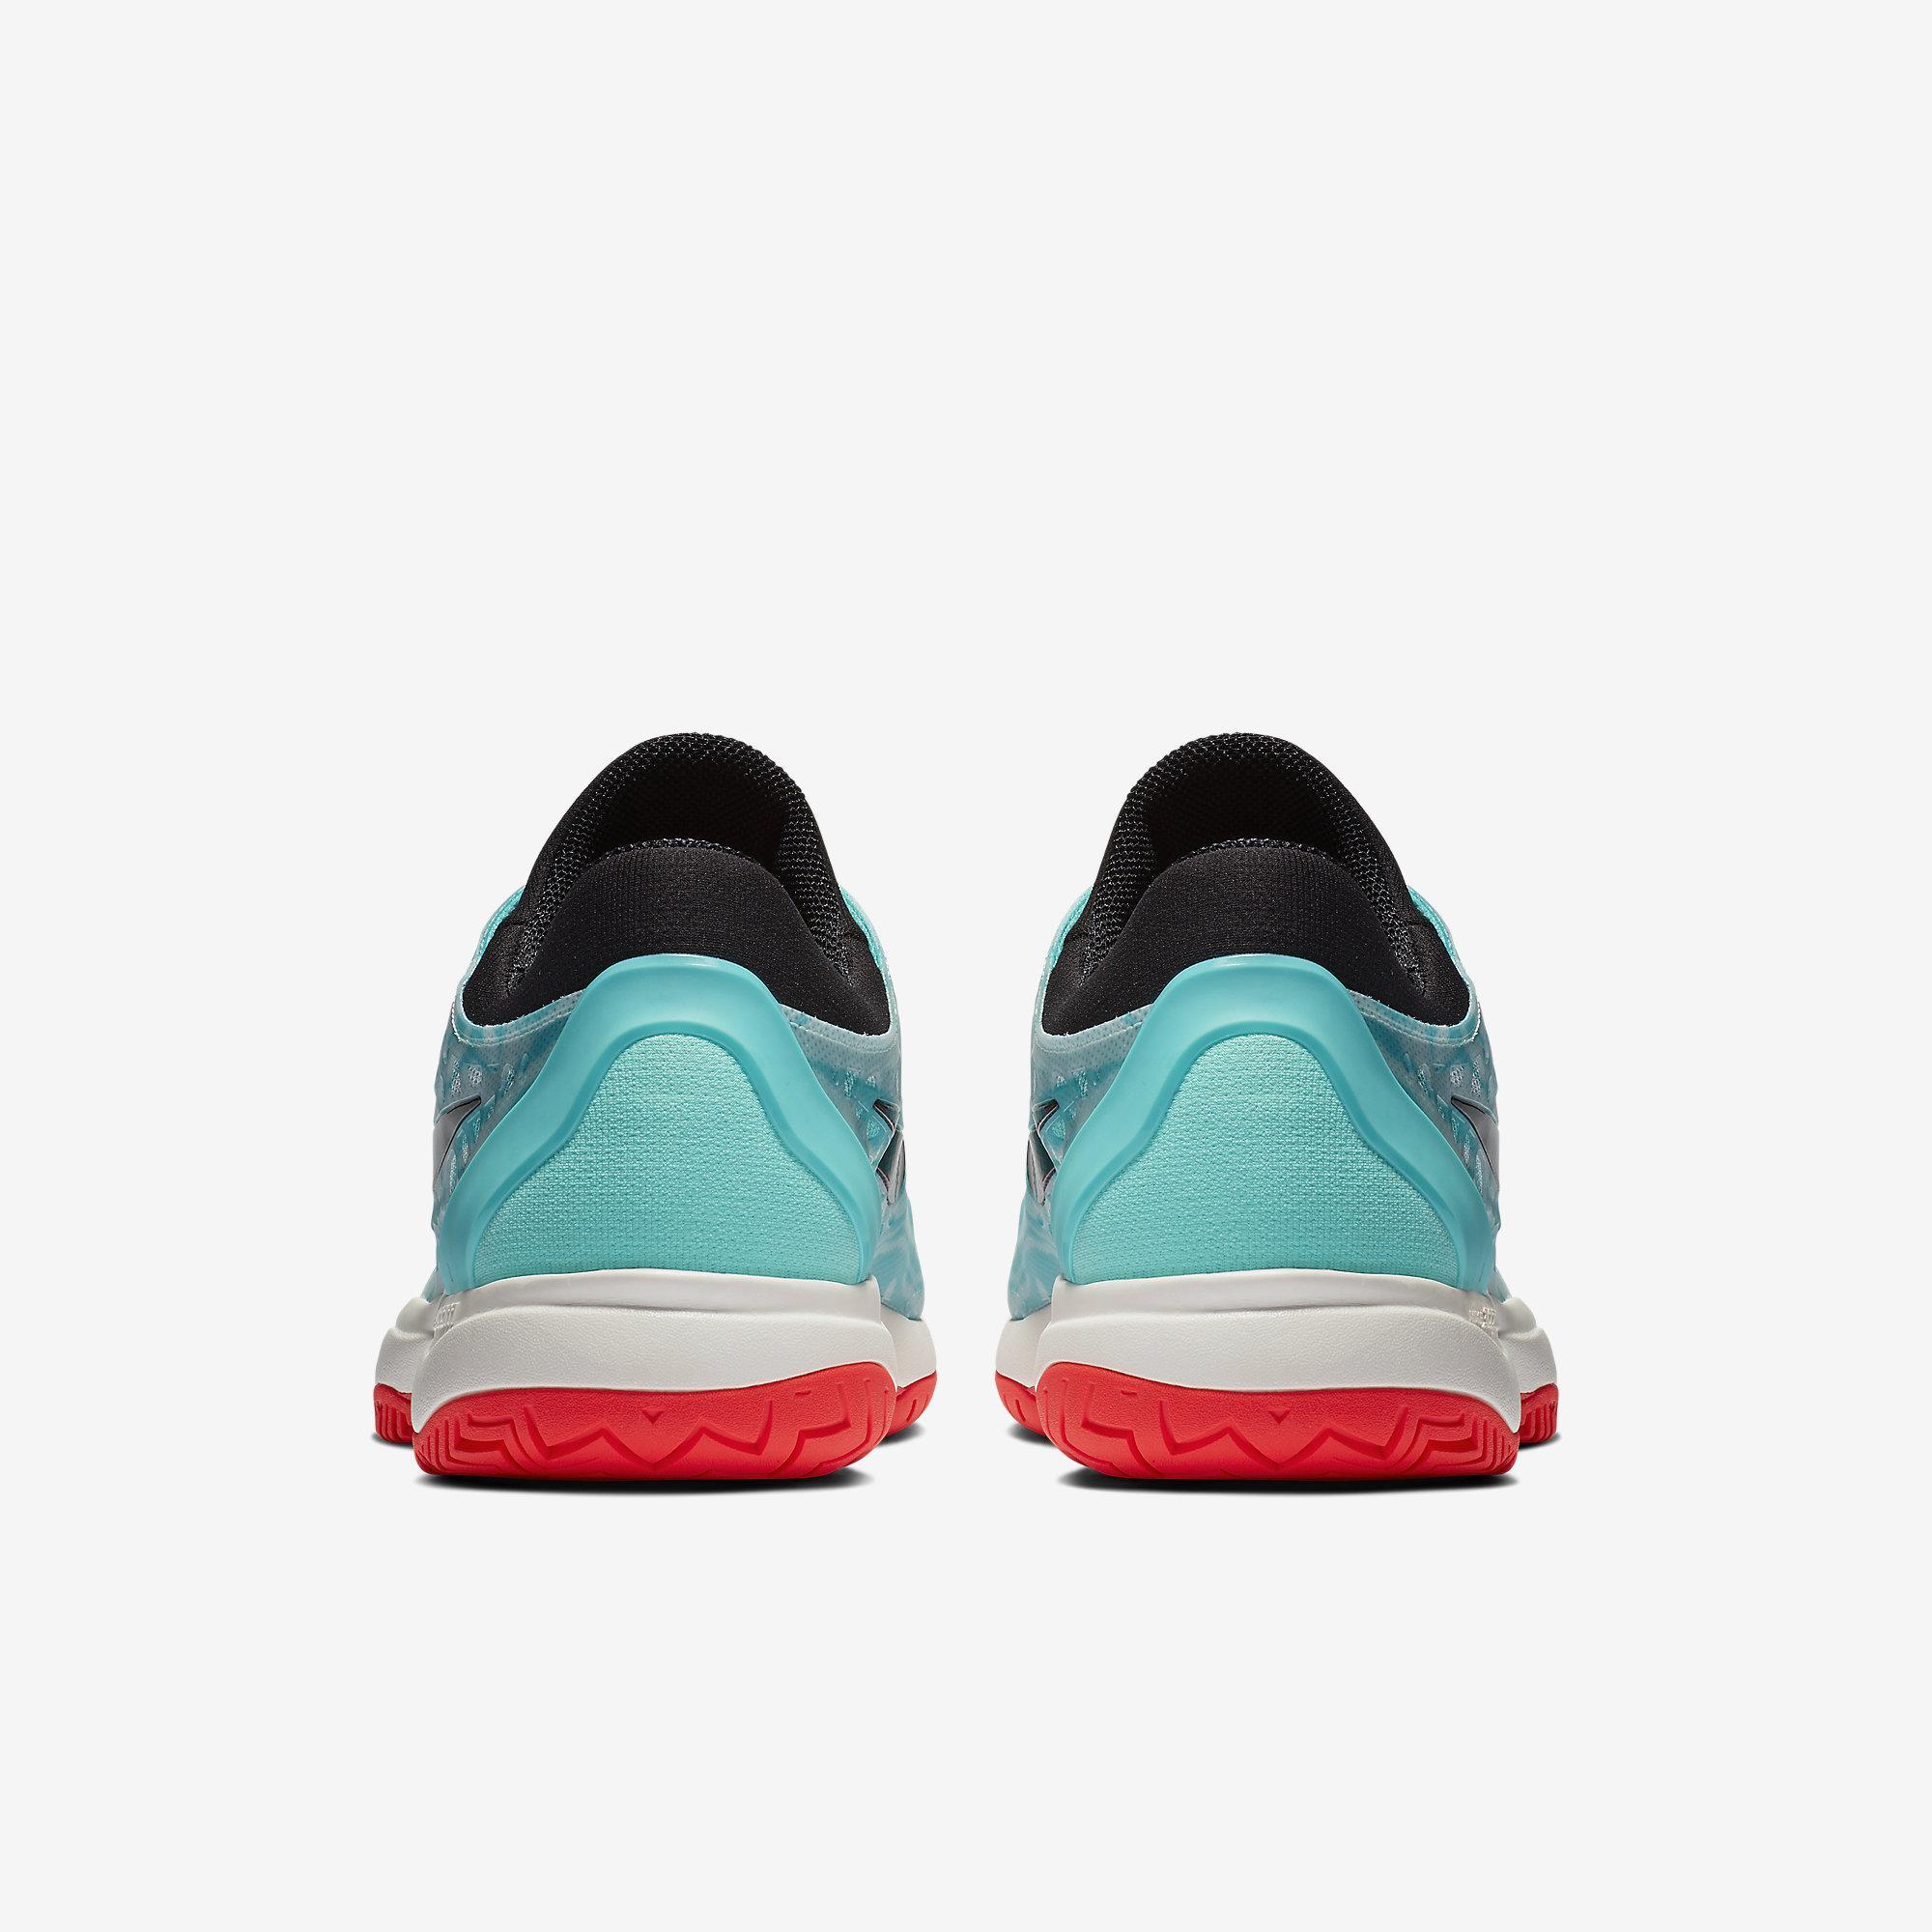 af05196b1d36 Nike Mens Zoom Cage 3 Tennis Shoes - Aurora Teal Tint Phantom Black ...